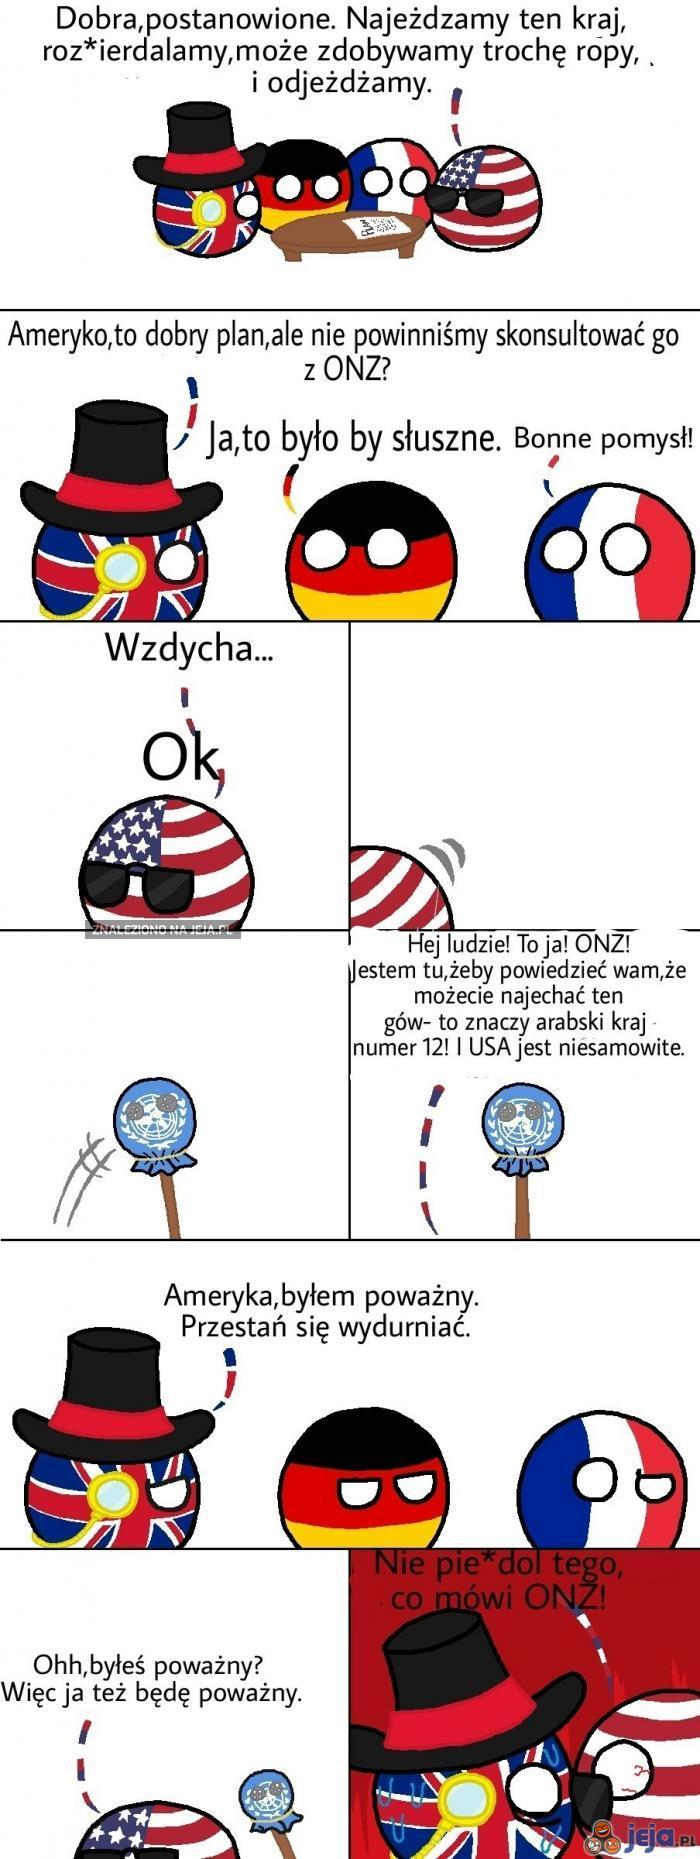 Co mówi ONZ